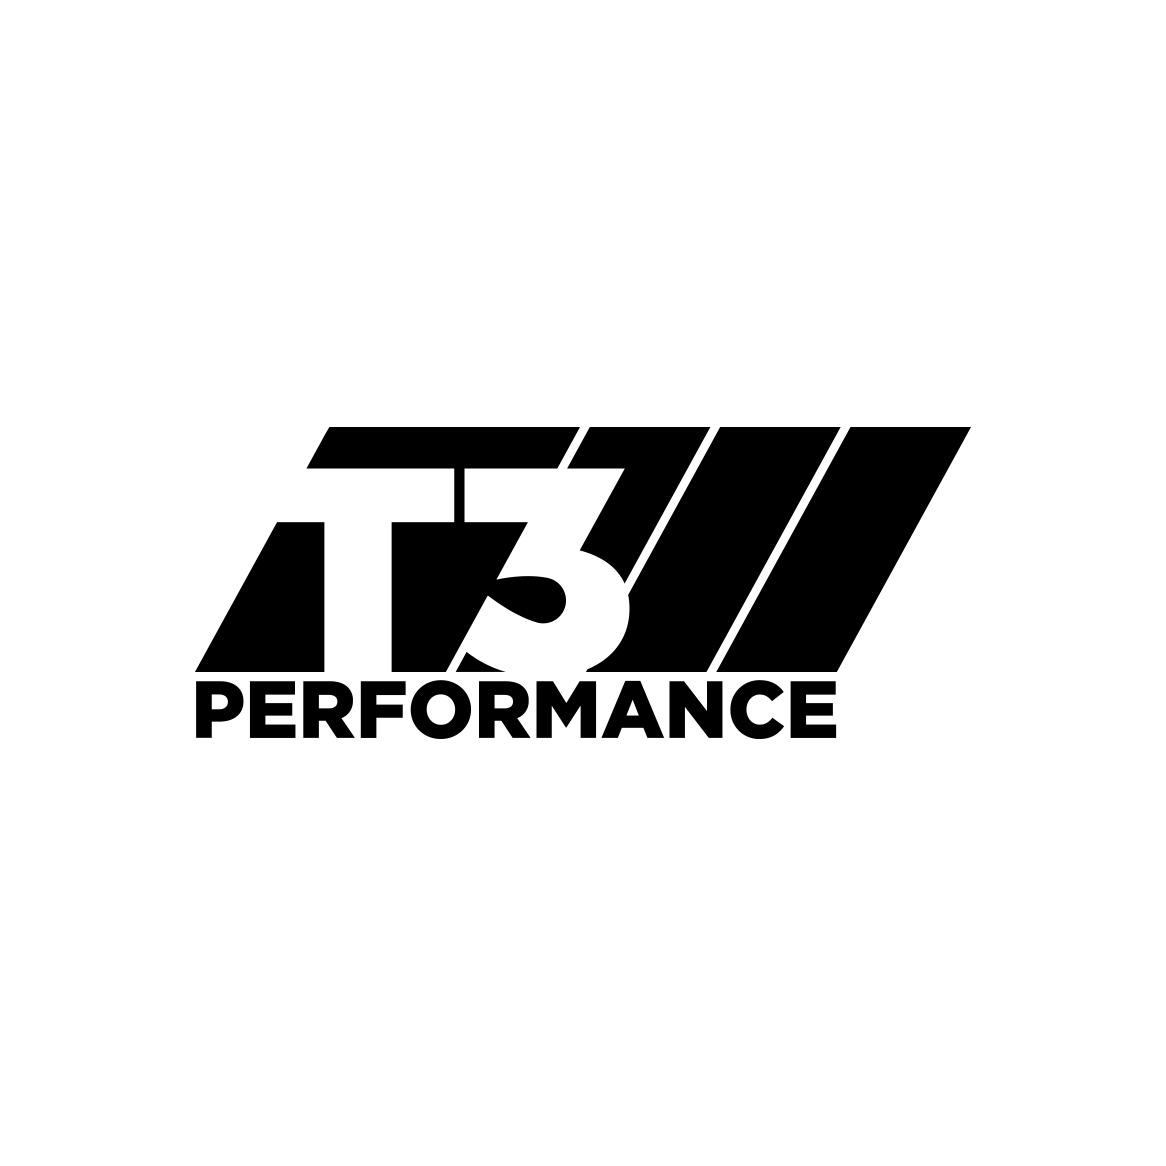 Sample image of logo design for T3 Performance.